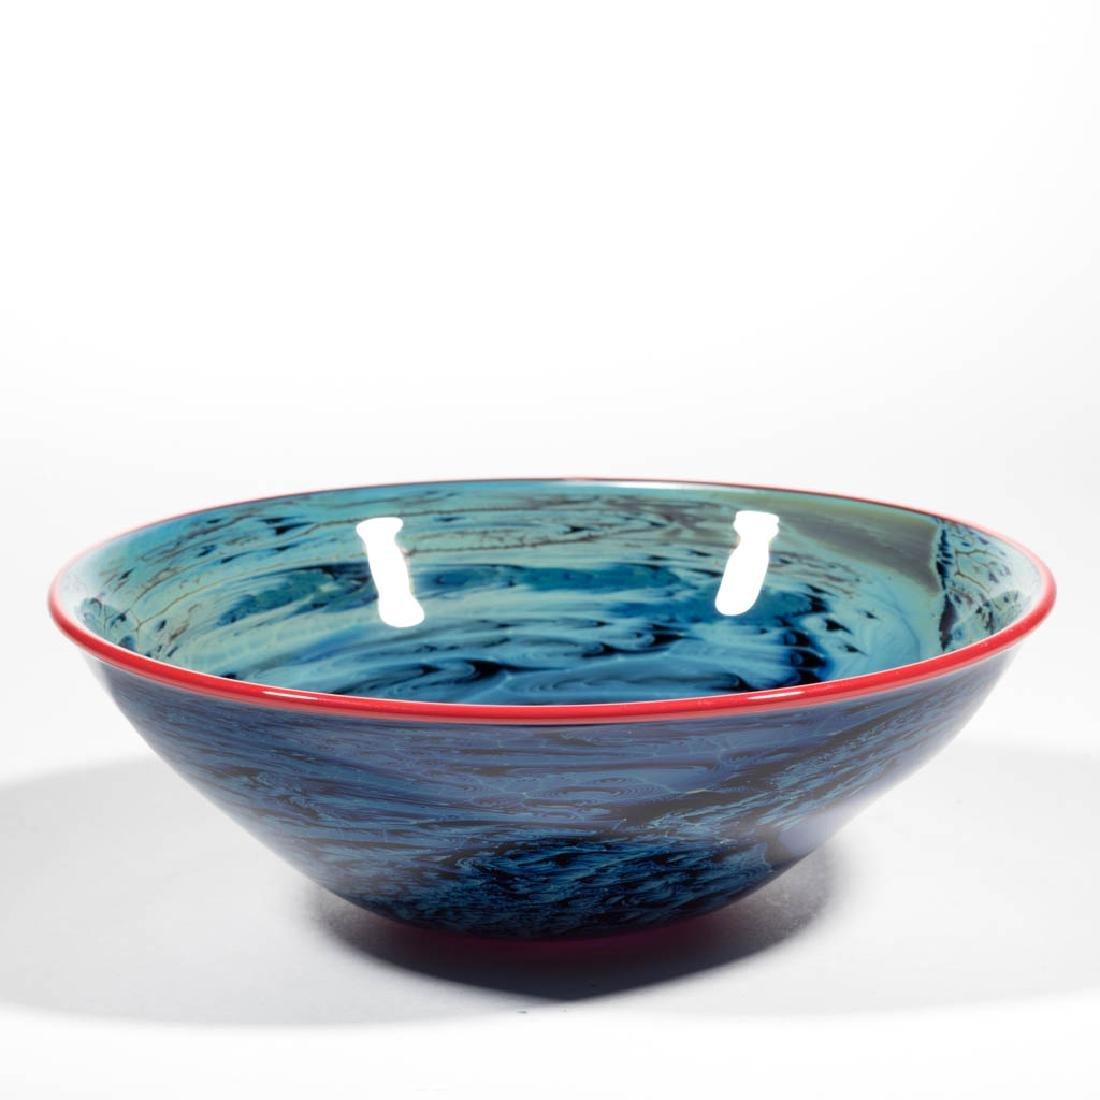 JOSH SIMPSON NEW MEXICO STUDIO ART GLASS BOWL